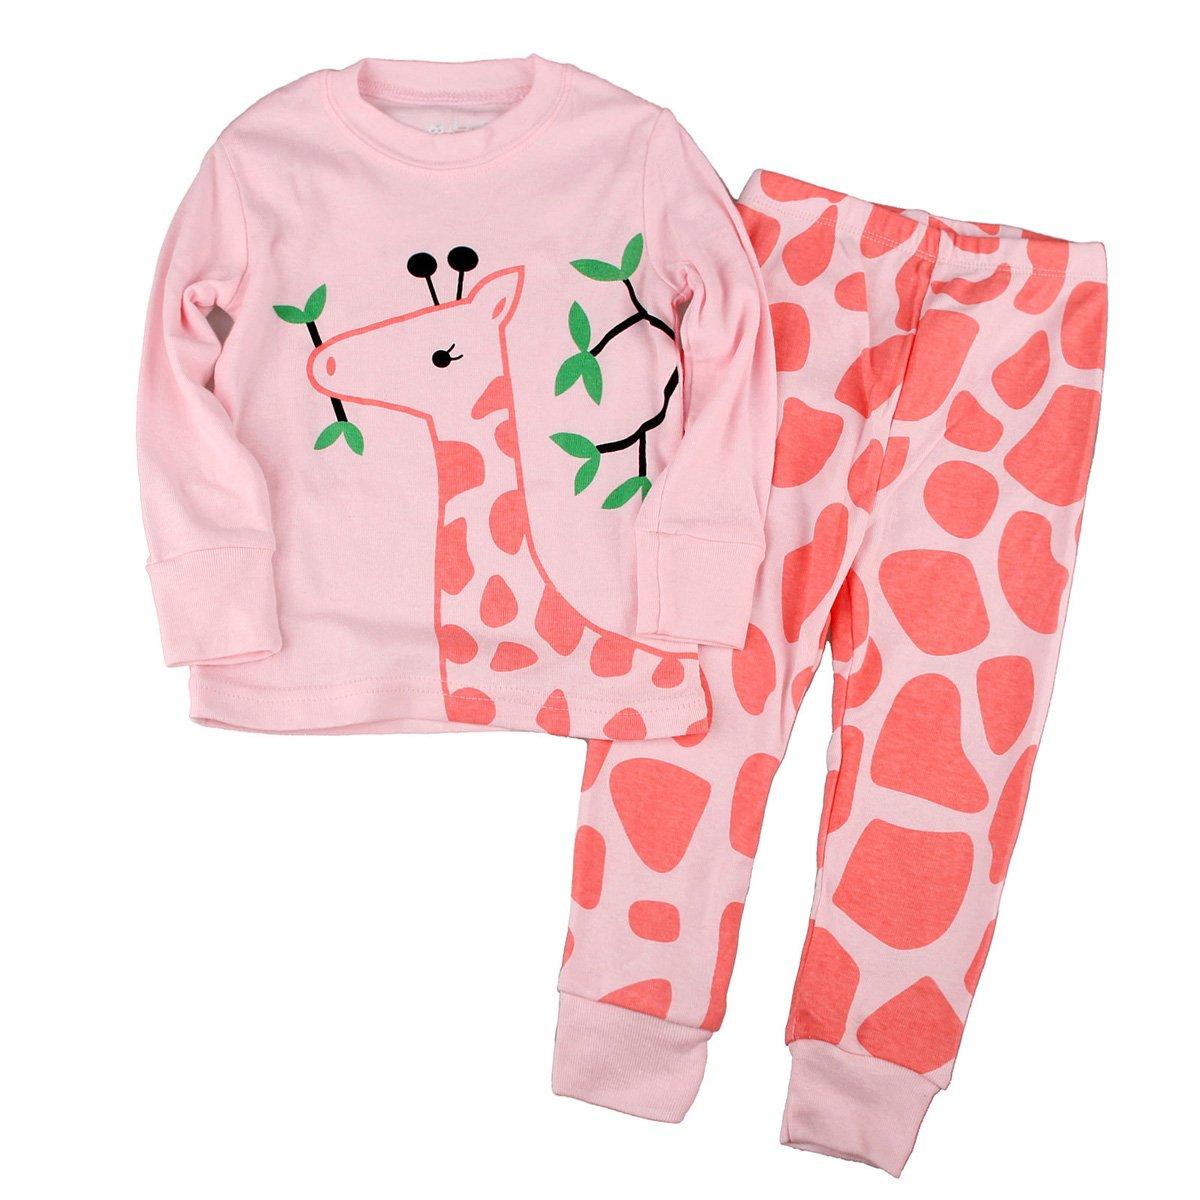 Gold treasure Little Kids Sleepwear Long Sleeve Pajama Set with Cartoon Pink Giraffe